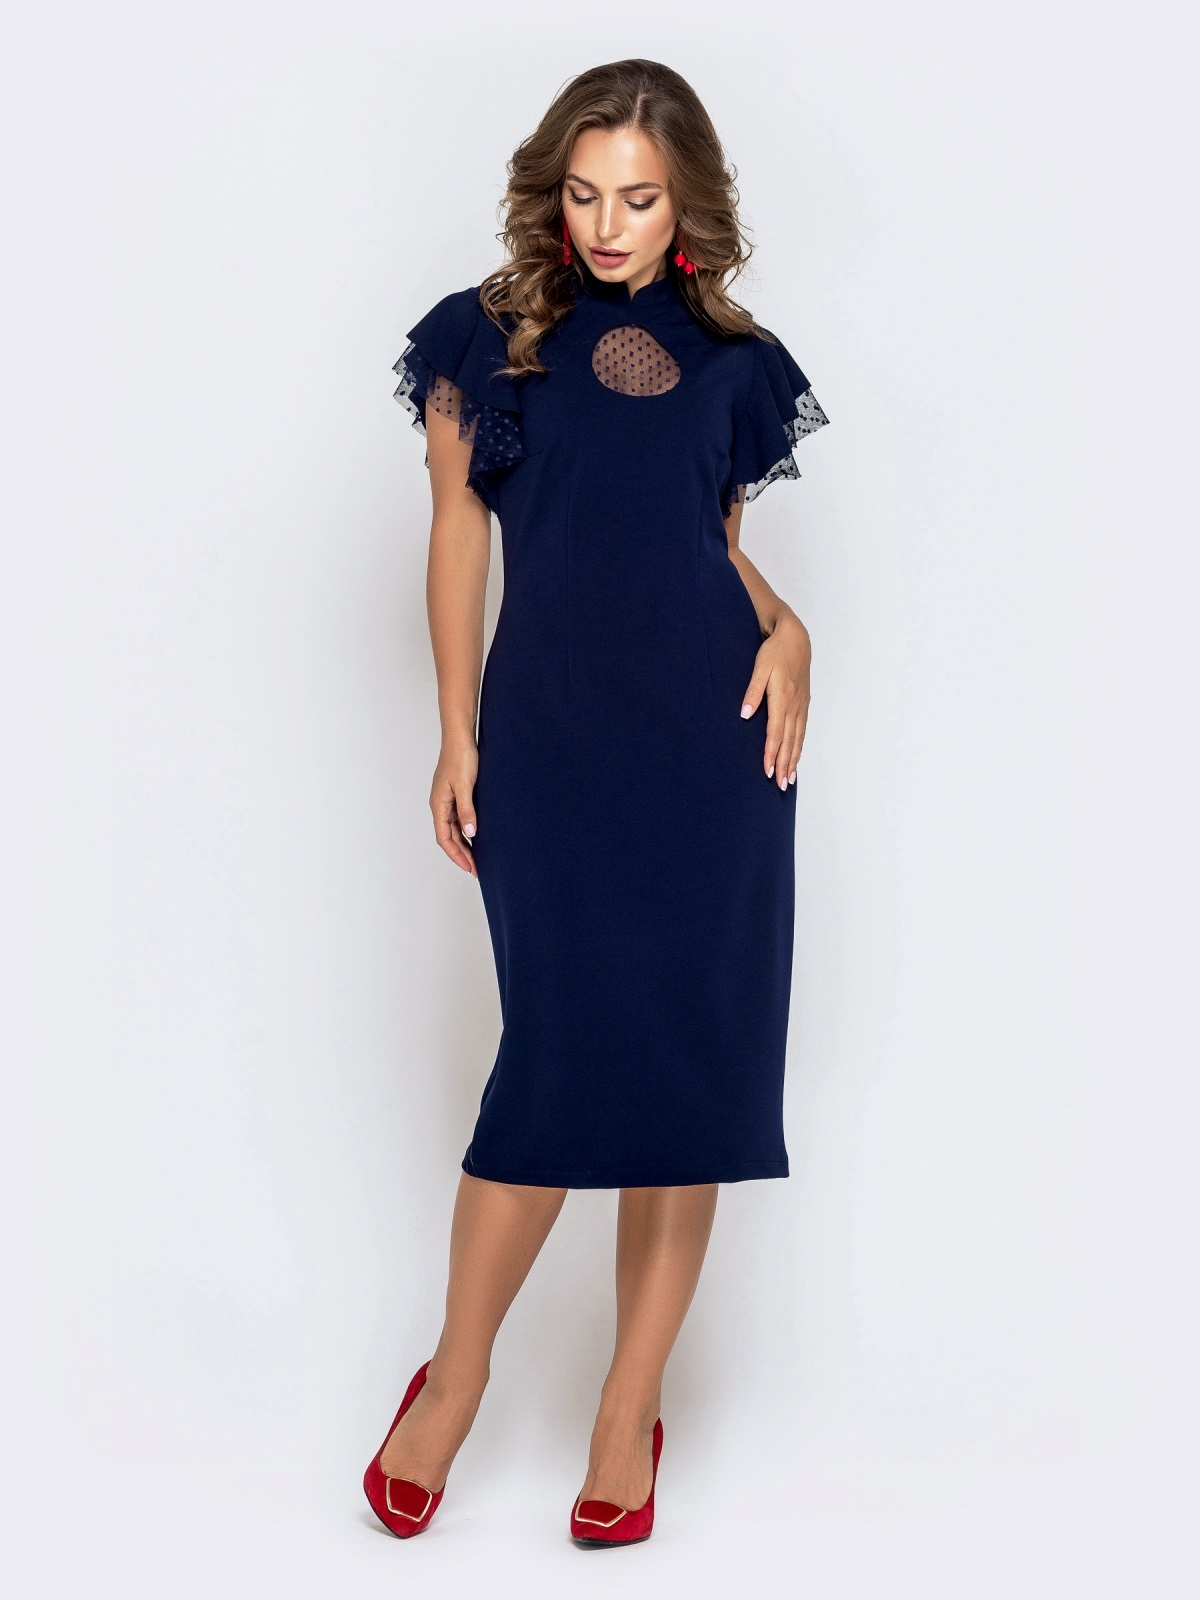 Синее платье-футляр с рюшами из фатина 40895, фото 1